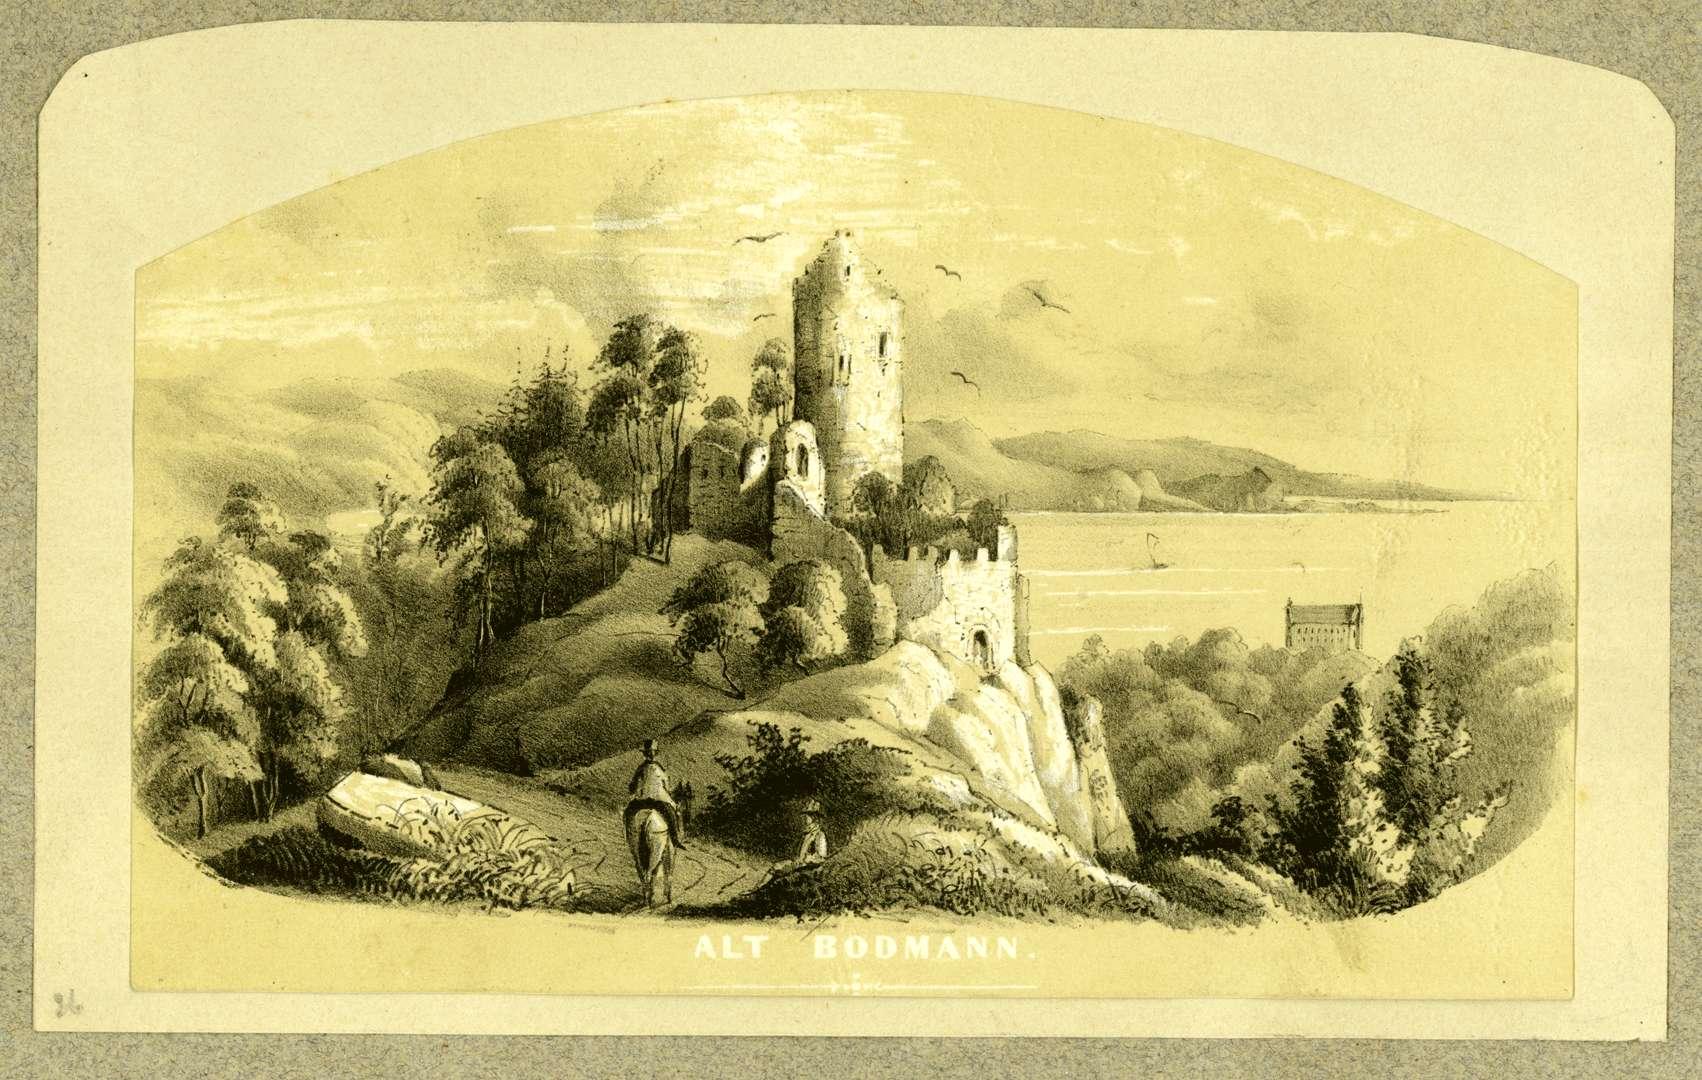 Alt-Bodmann, Bild 1